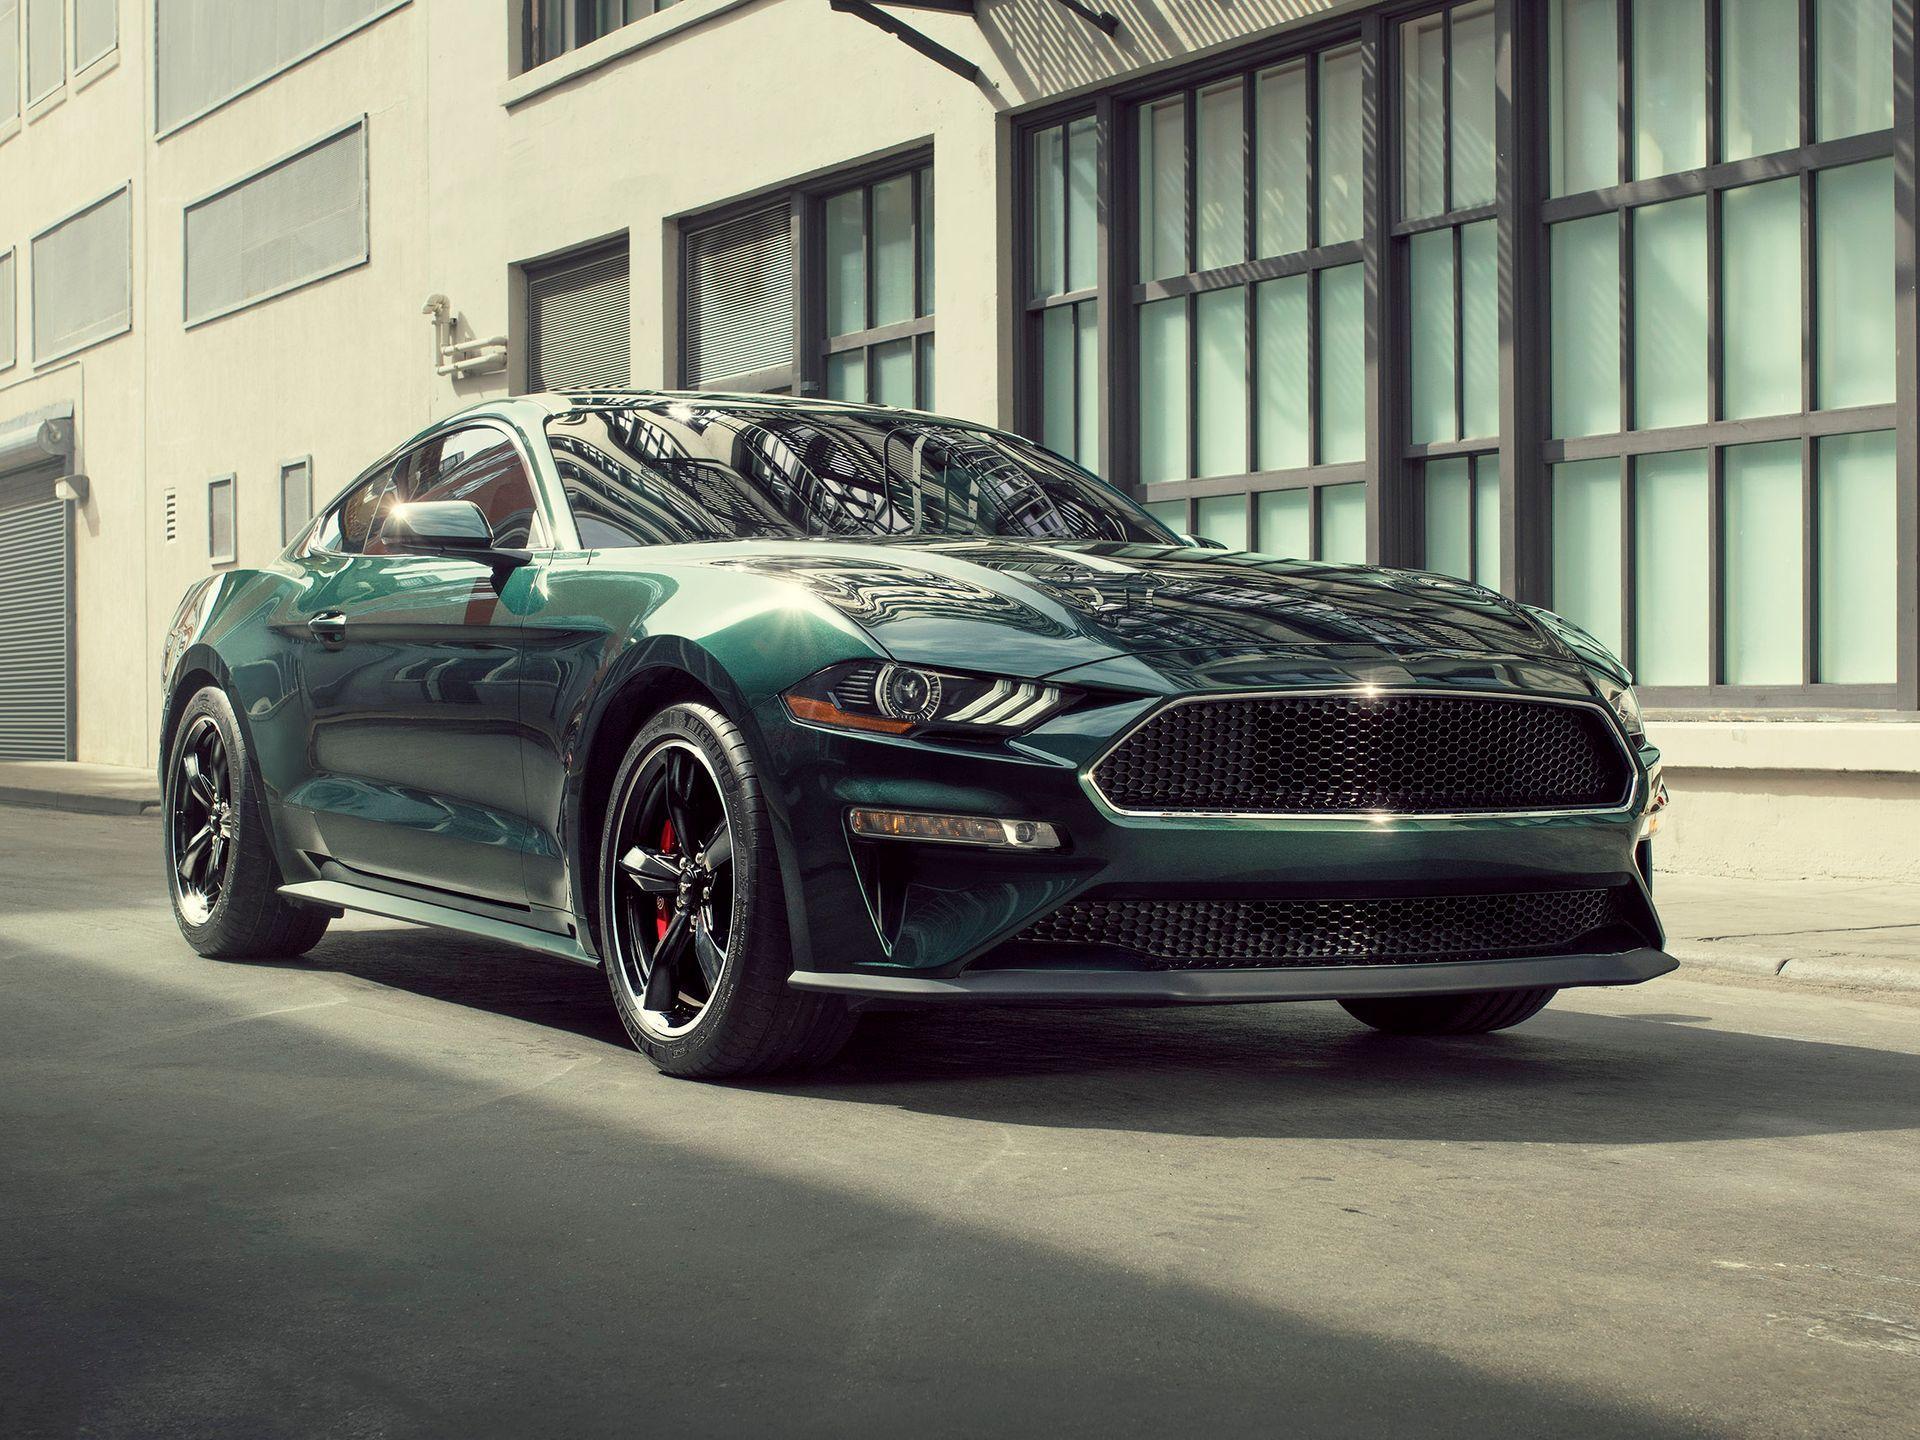 2019 2020 Ford Mustang Bullitt Ford Mustang Bullitt Mustang Bullitt Ford Mustang